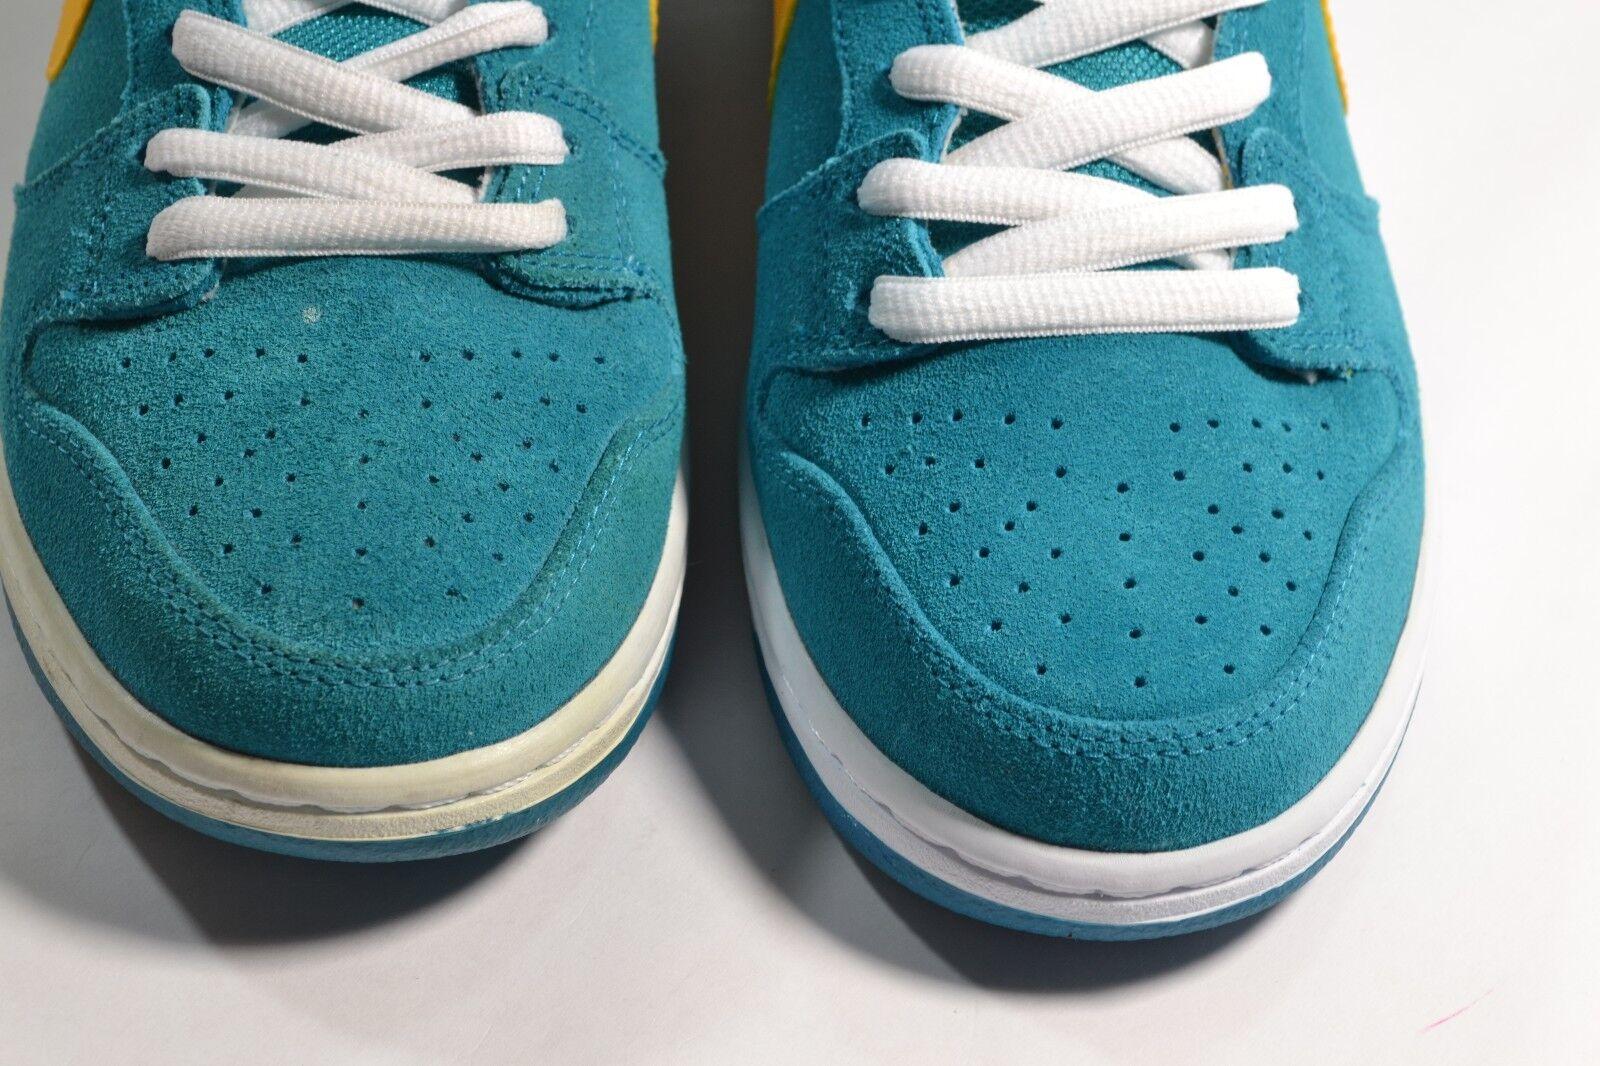 Nike dunk hohe pro - - - sb blaugrün universität gold Weiß